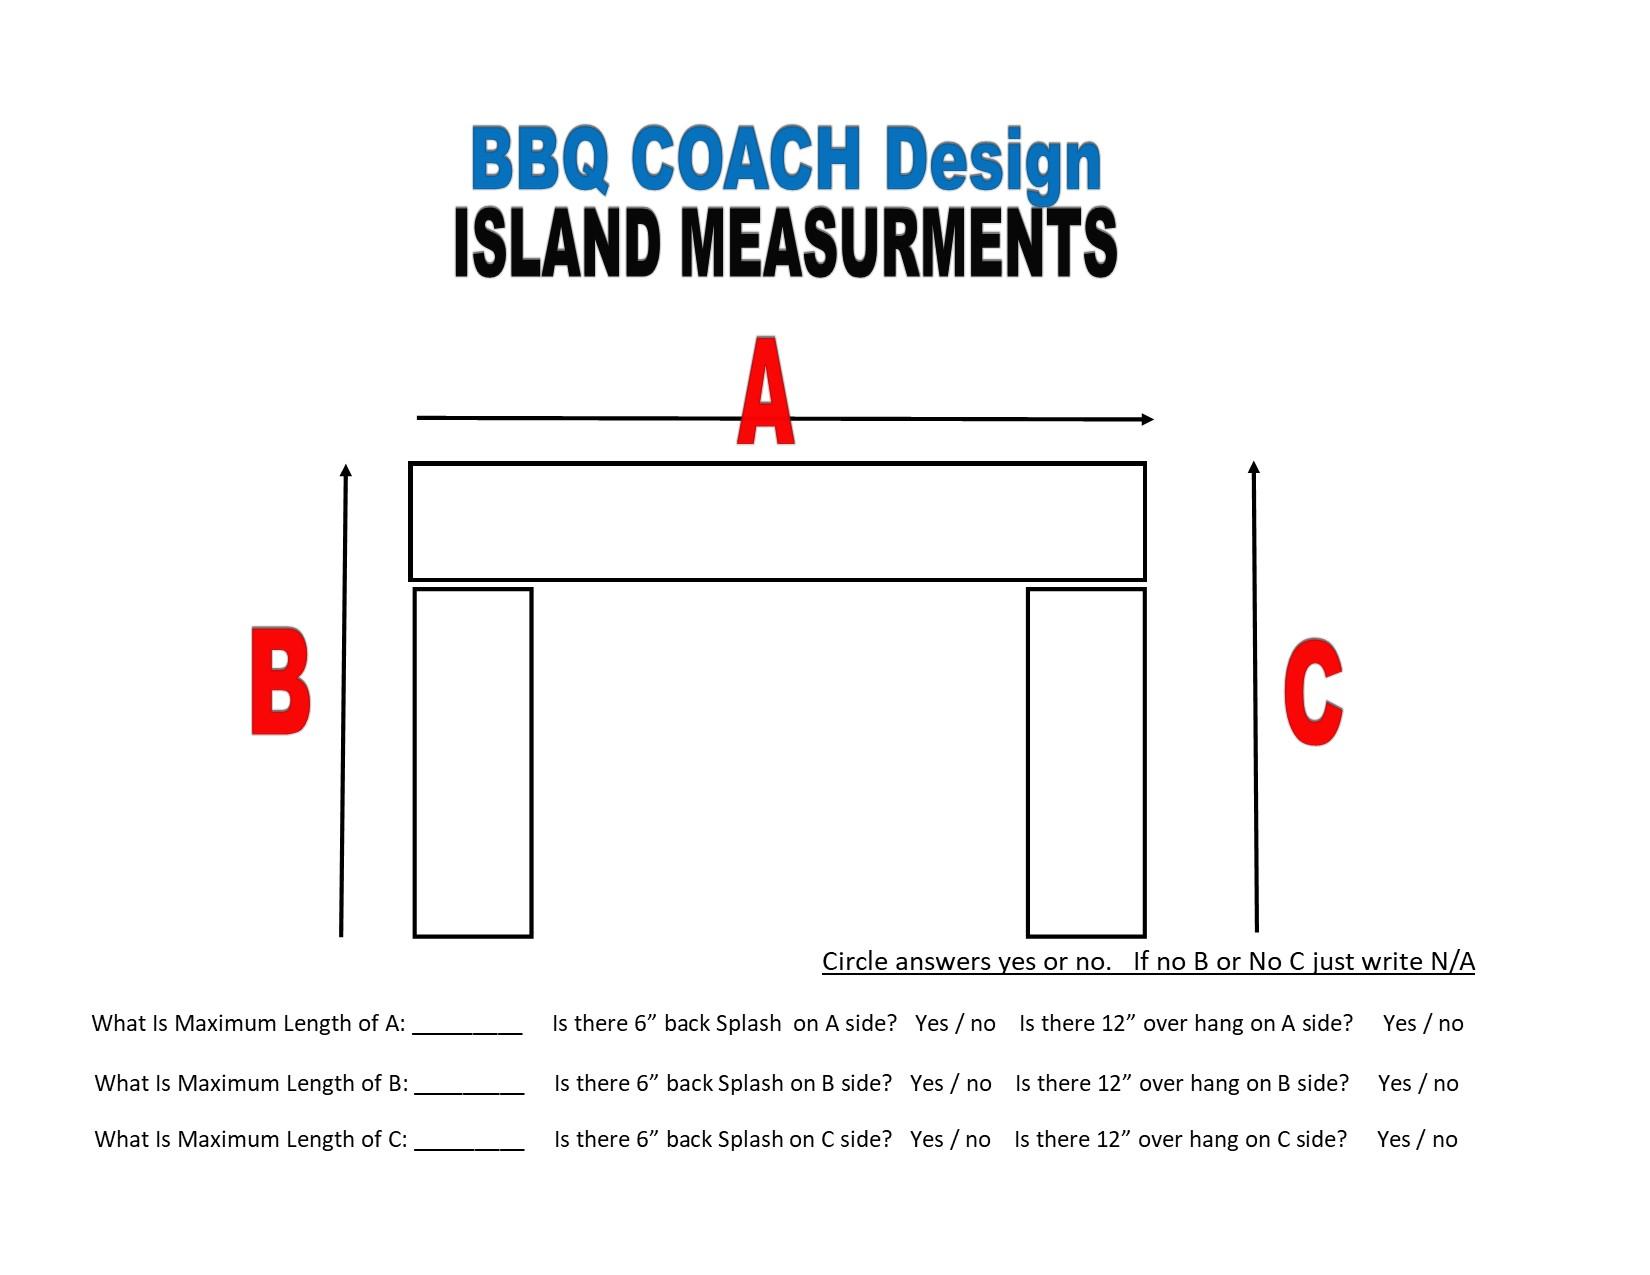 island-design-measurements.jpg